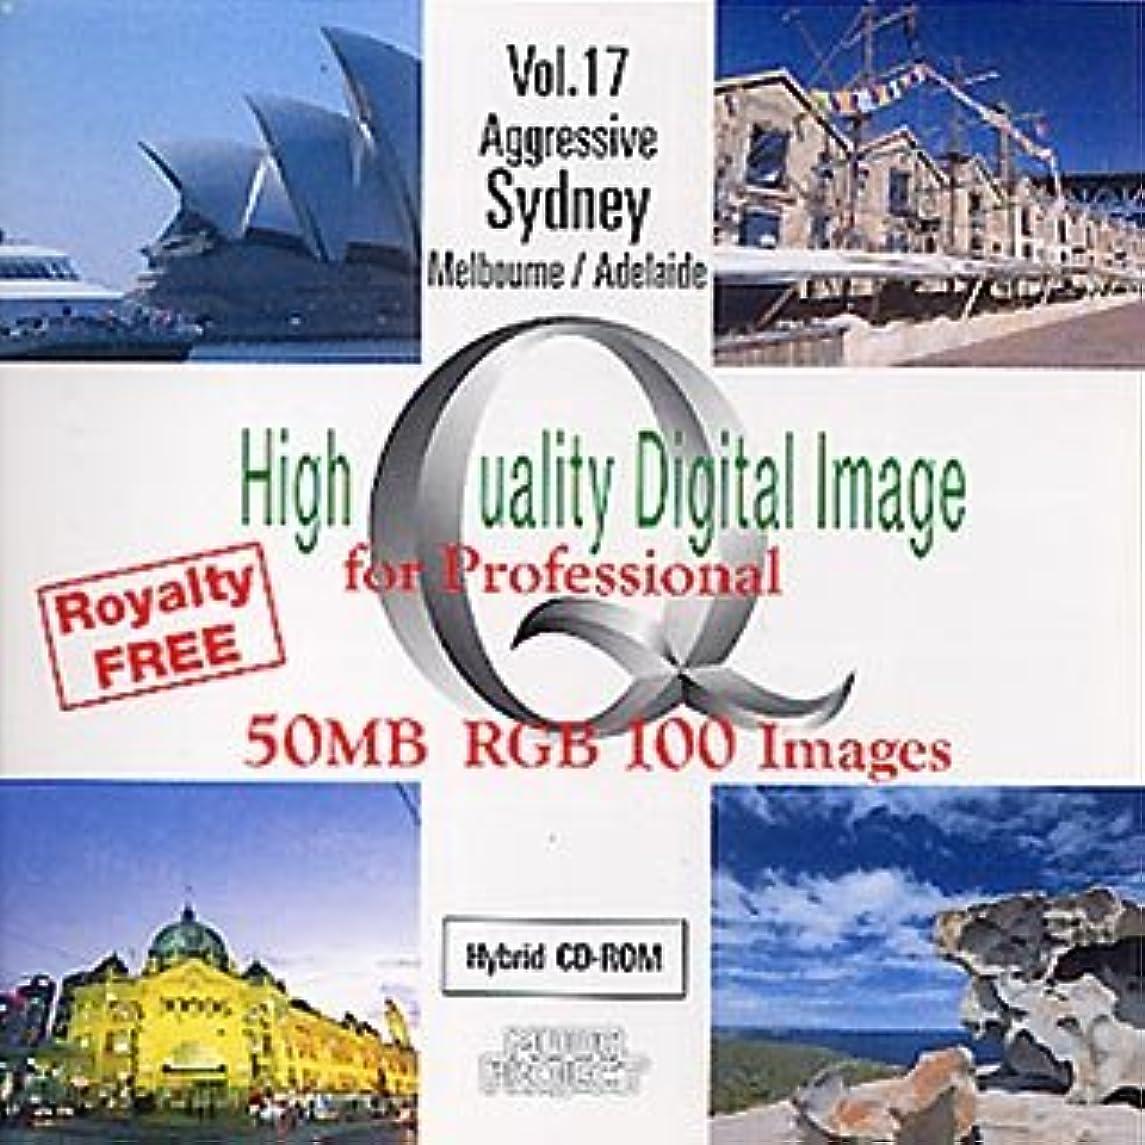 High Quality Digital Image for Professional Vol.17 Aggressive Sydney Melbourne / Adelaide